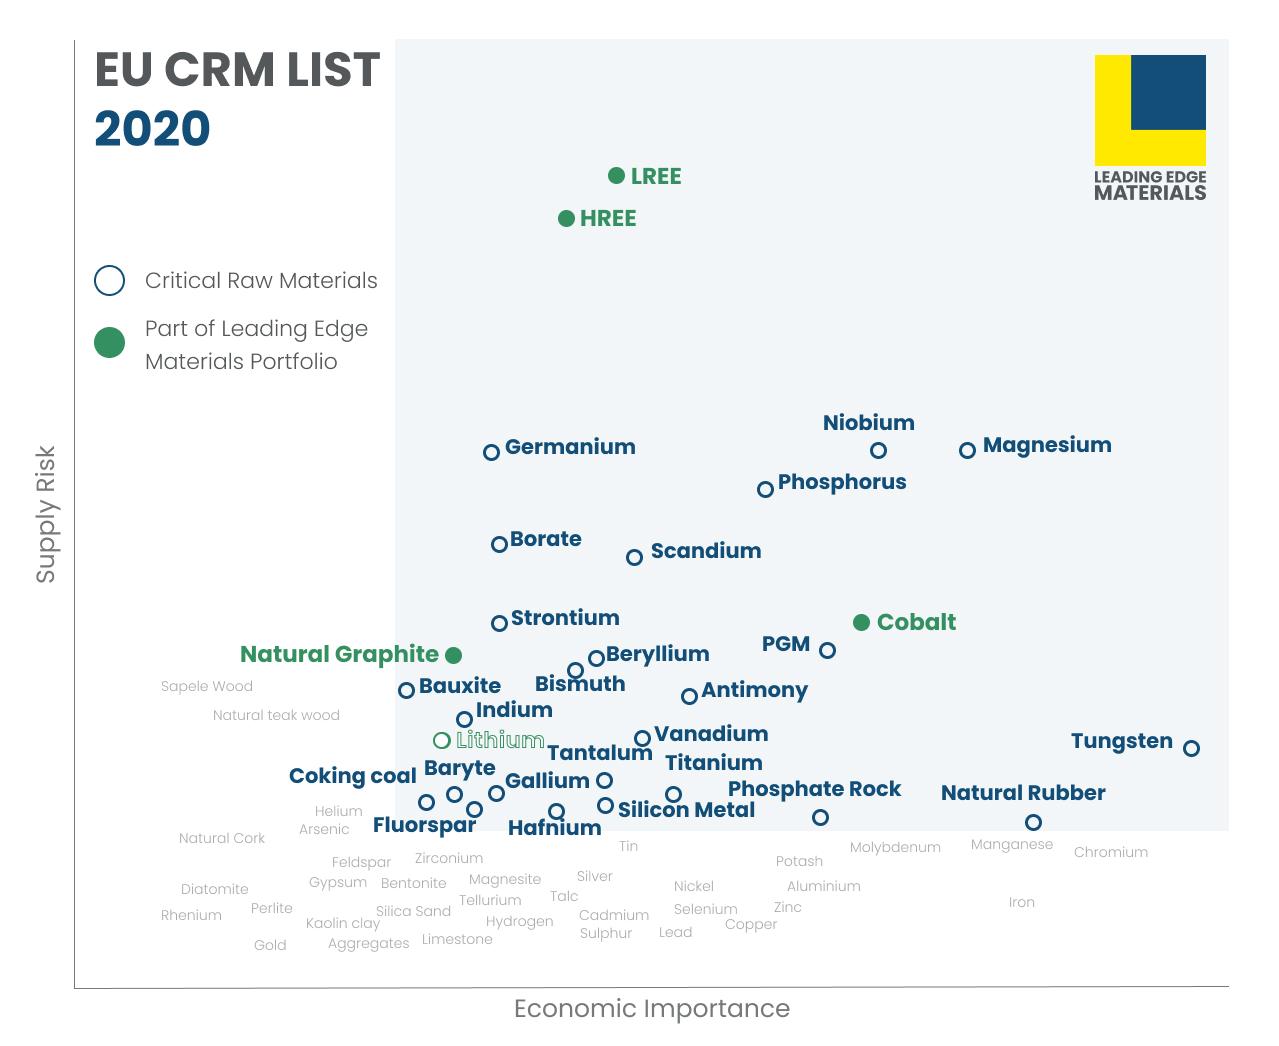 EU CRM LIST 2020